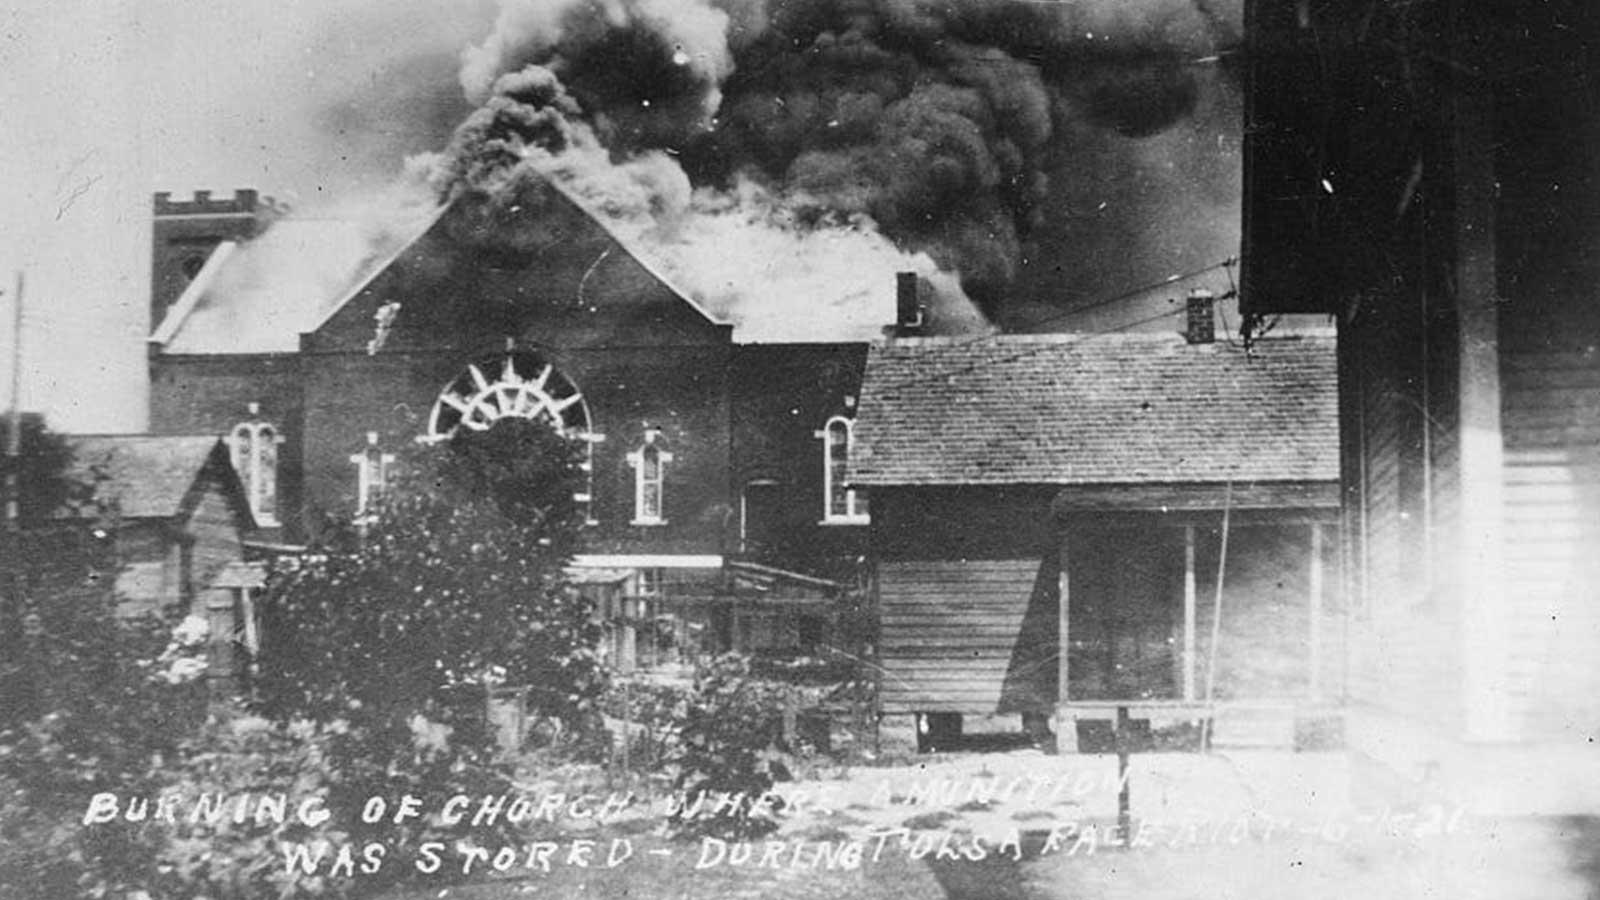 Mount Zion Baptist Church burns during the Tulsa race massacre.